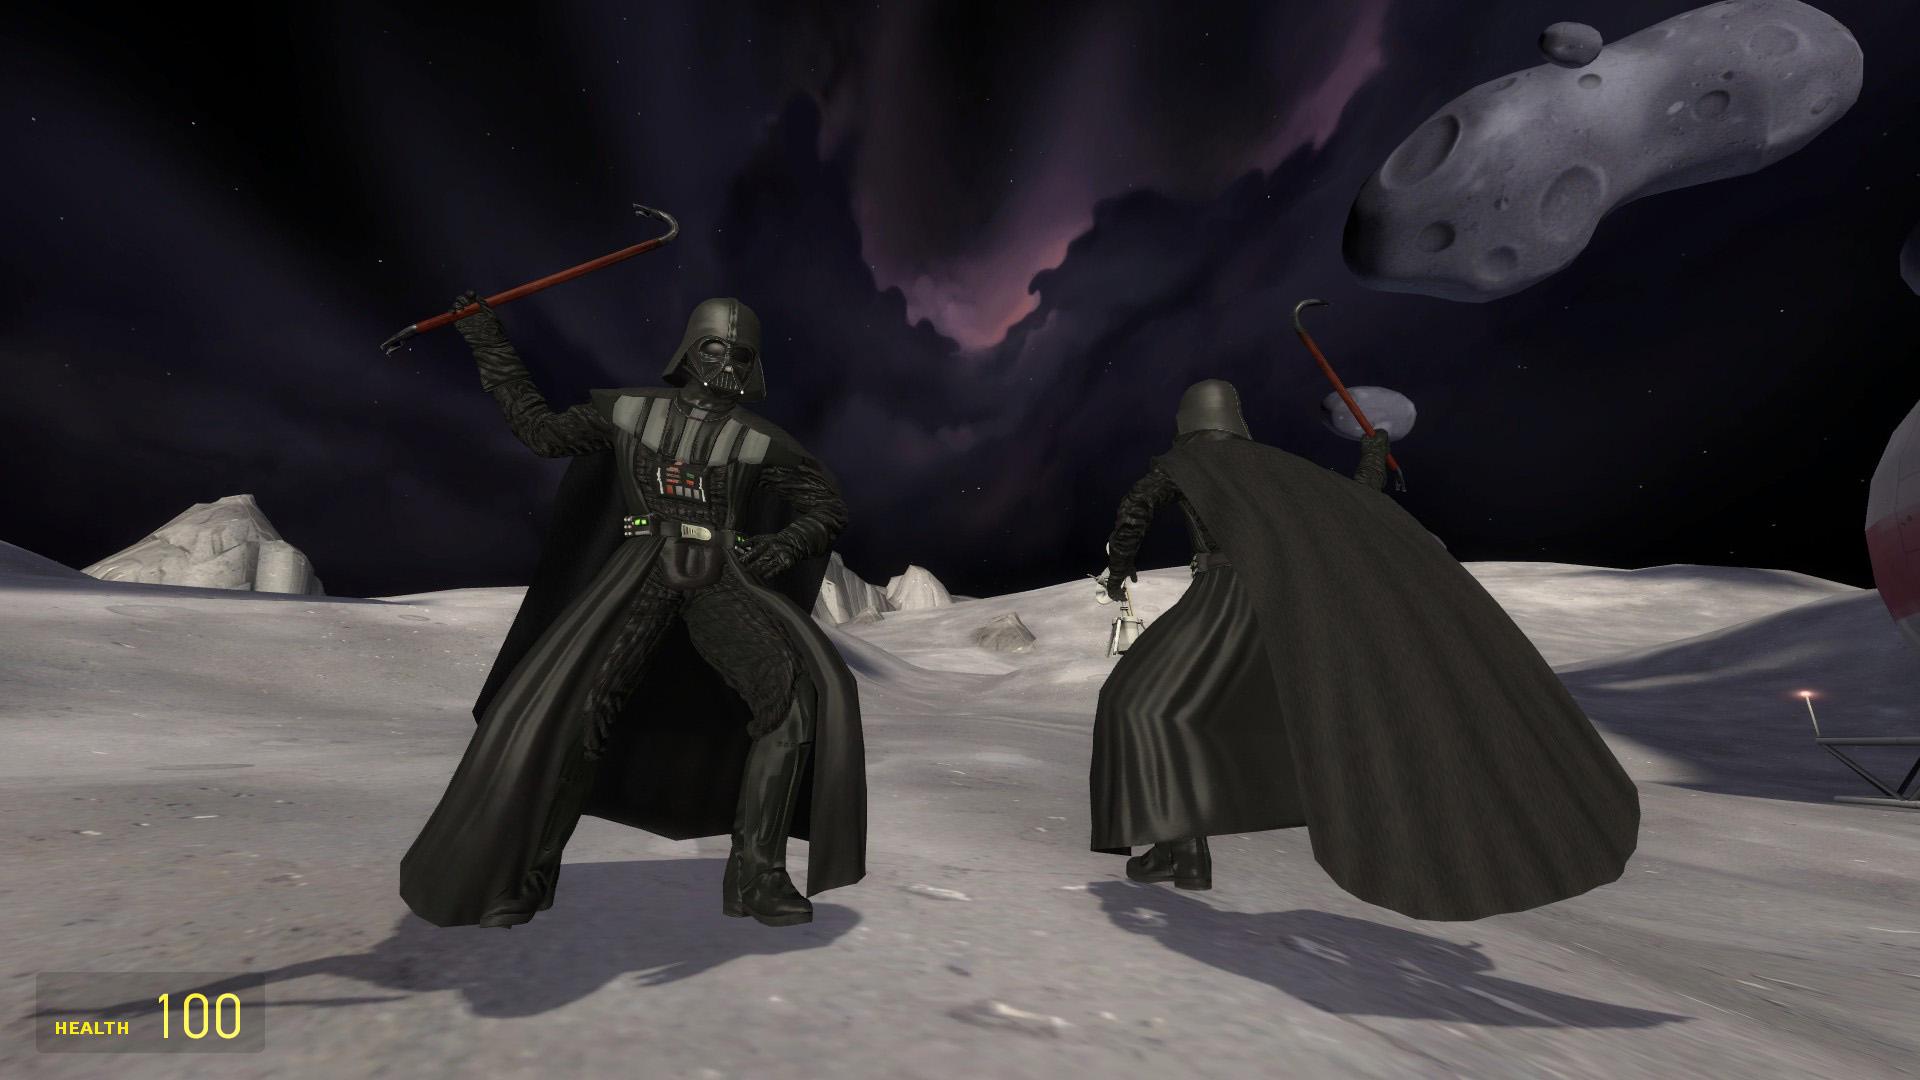 STAR WARS Darth Vader Playermodel | SGM Community (Serious GMod)